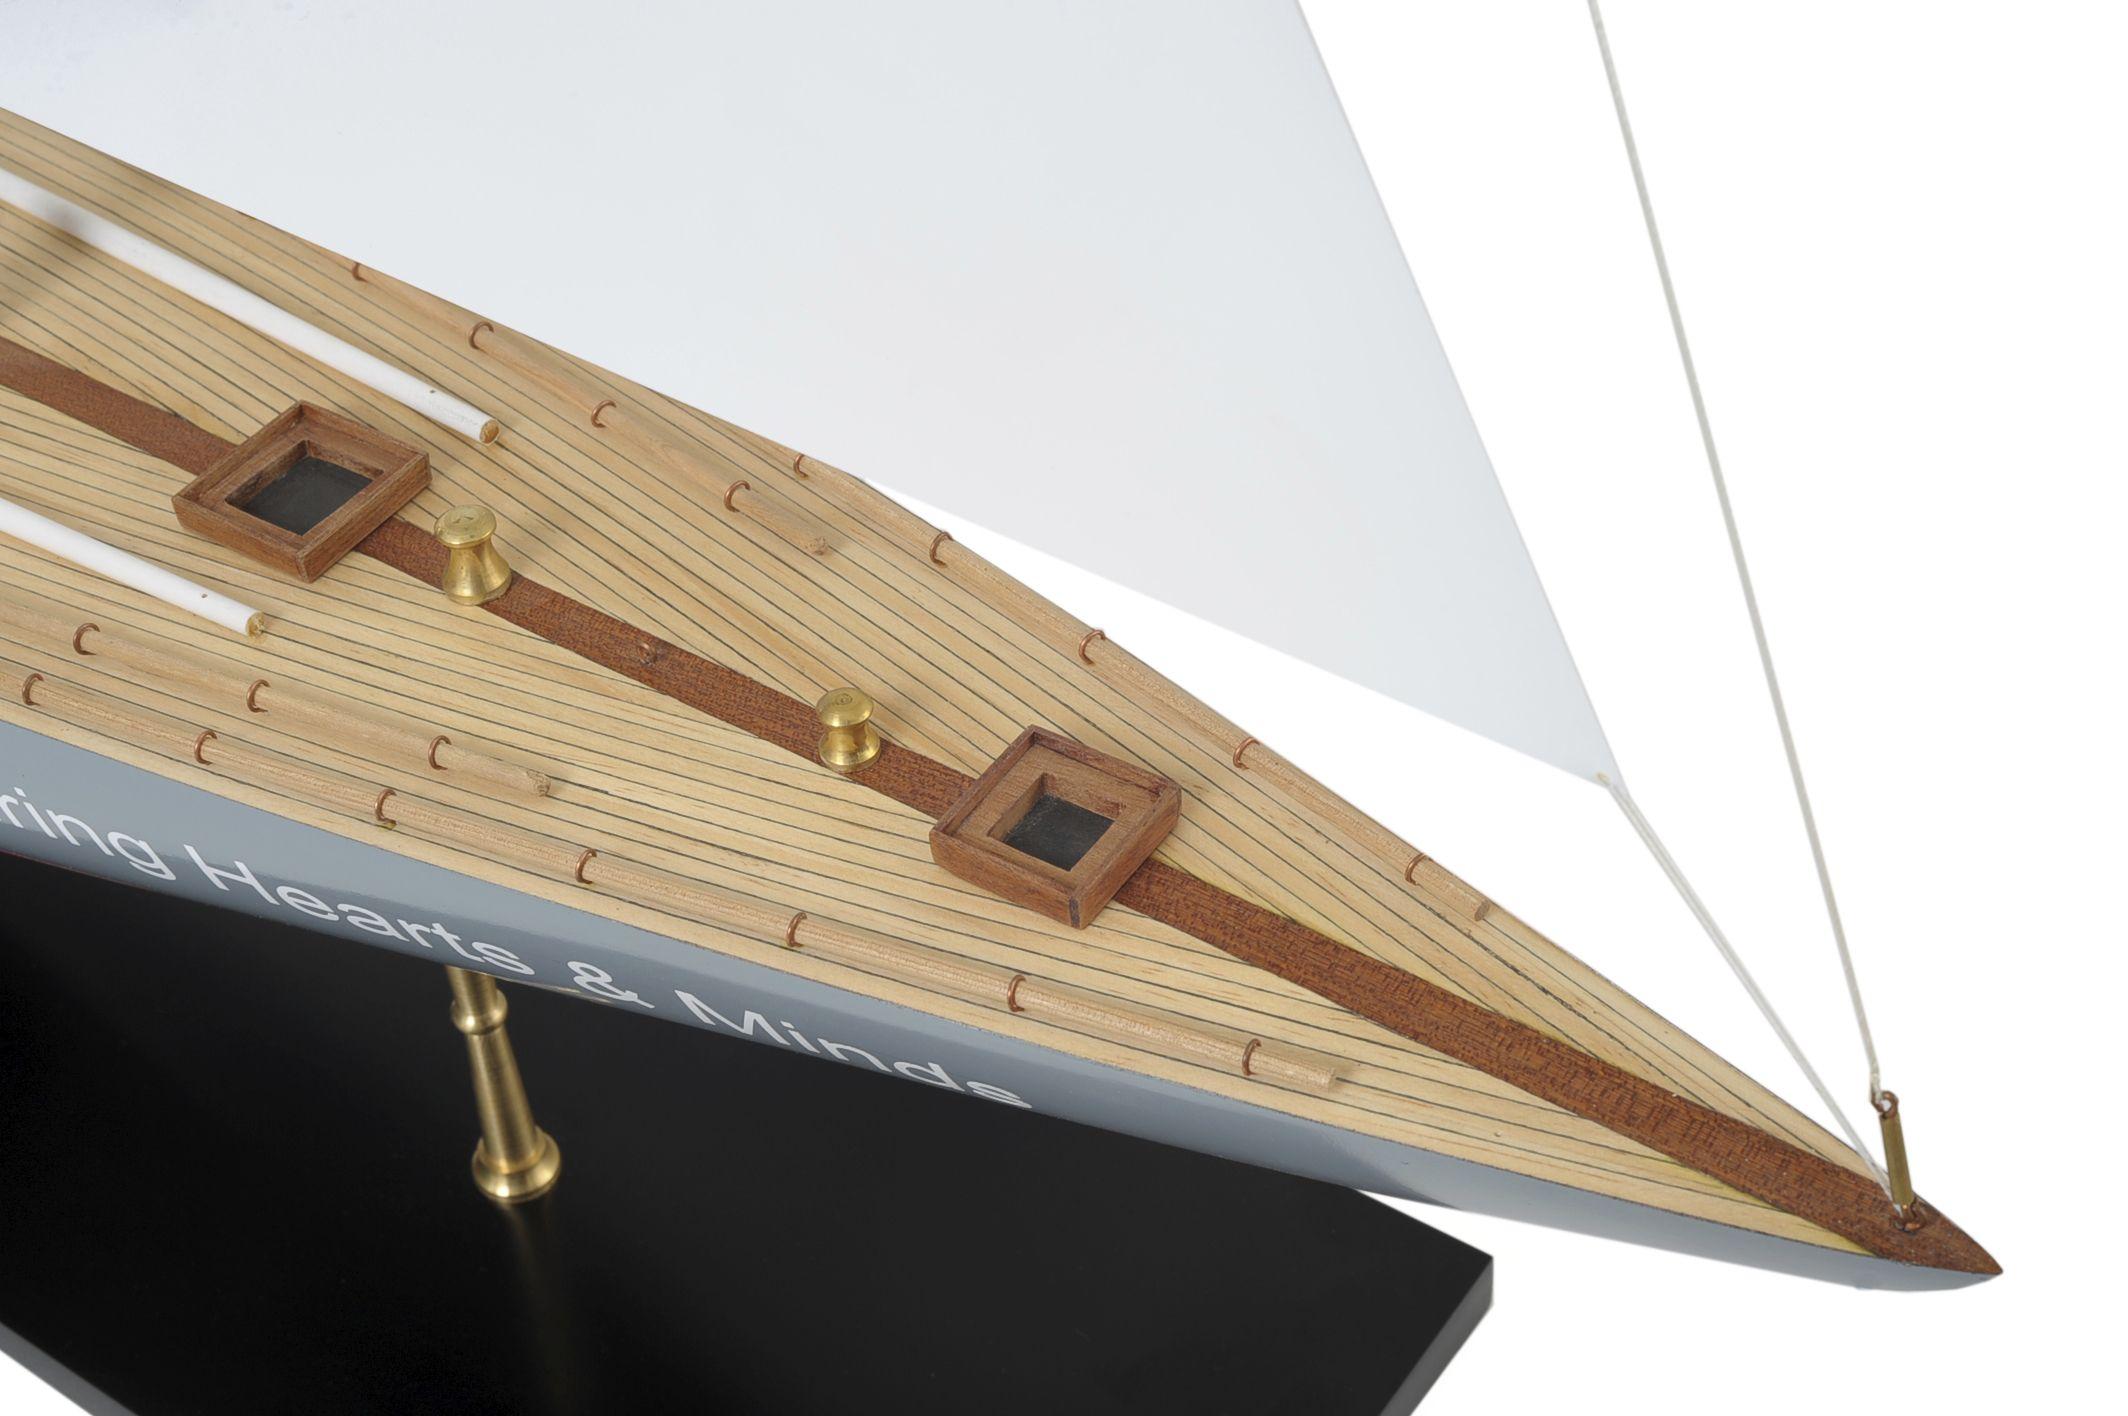 1519-8981-Enterprise-Model-Yacht